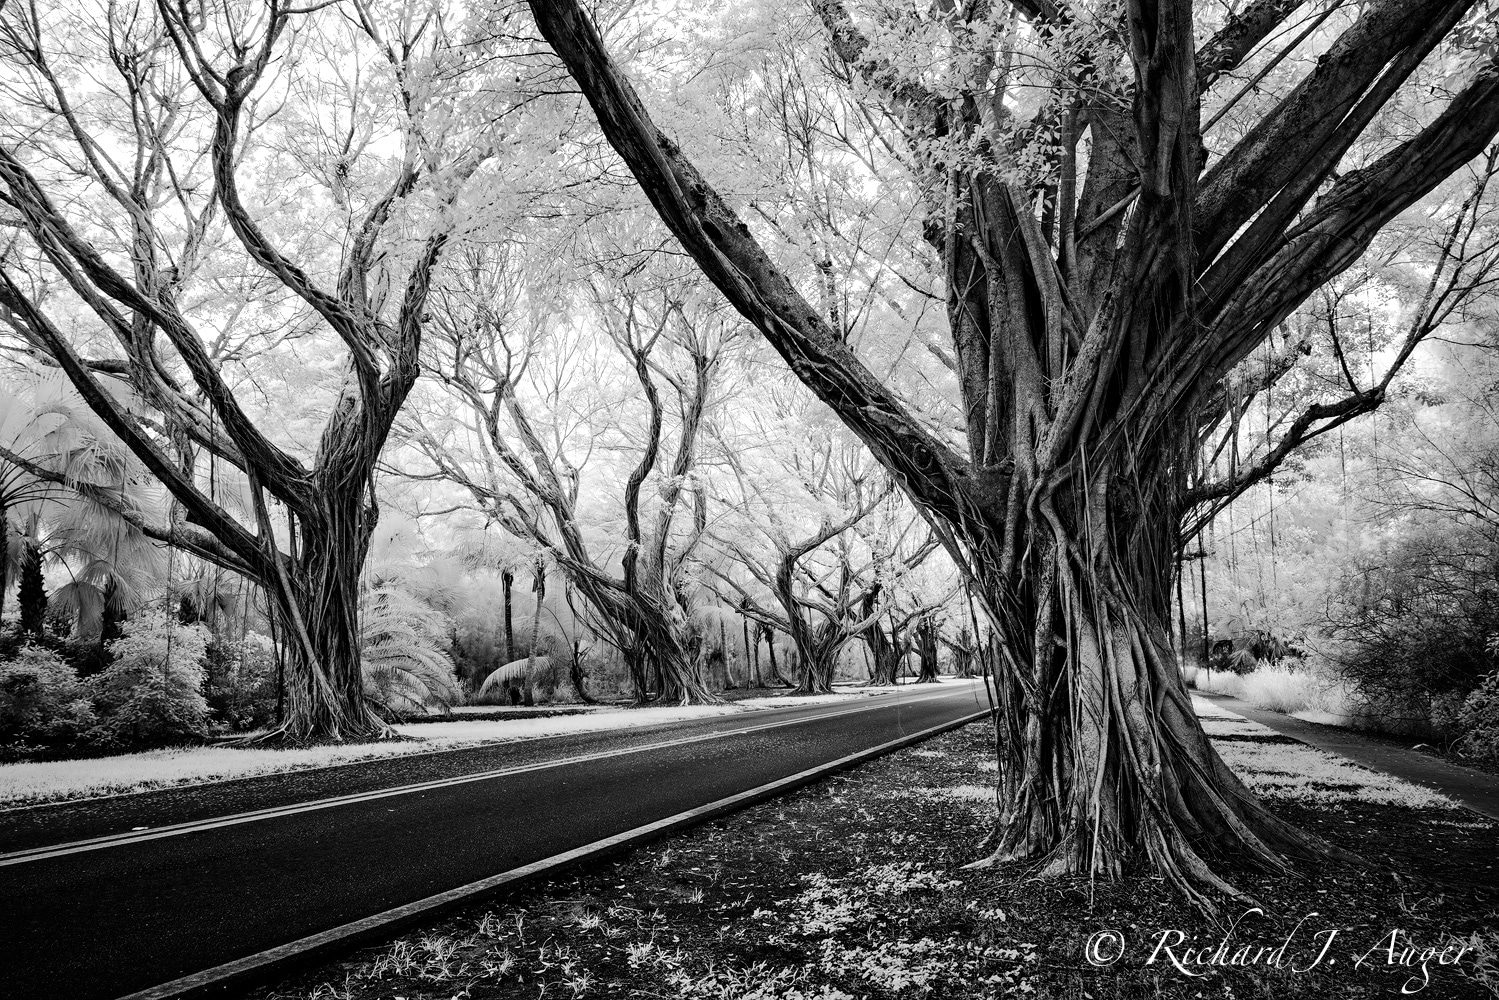 Banyan Trees, Bridge Road, Hobe Sound, Florida, Jupiter Island, Monochrome, Black and White, Infrared, Photograph